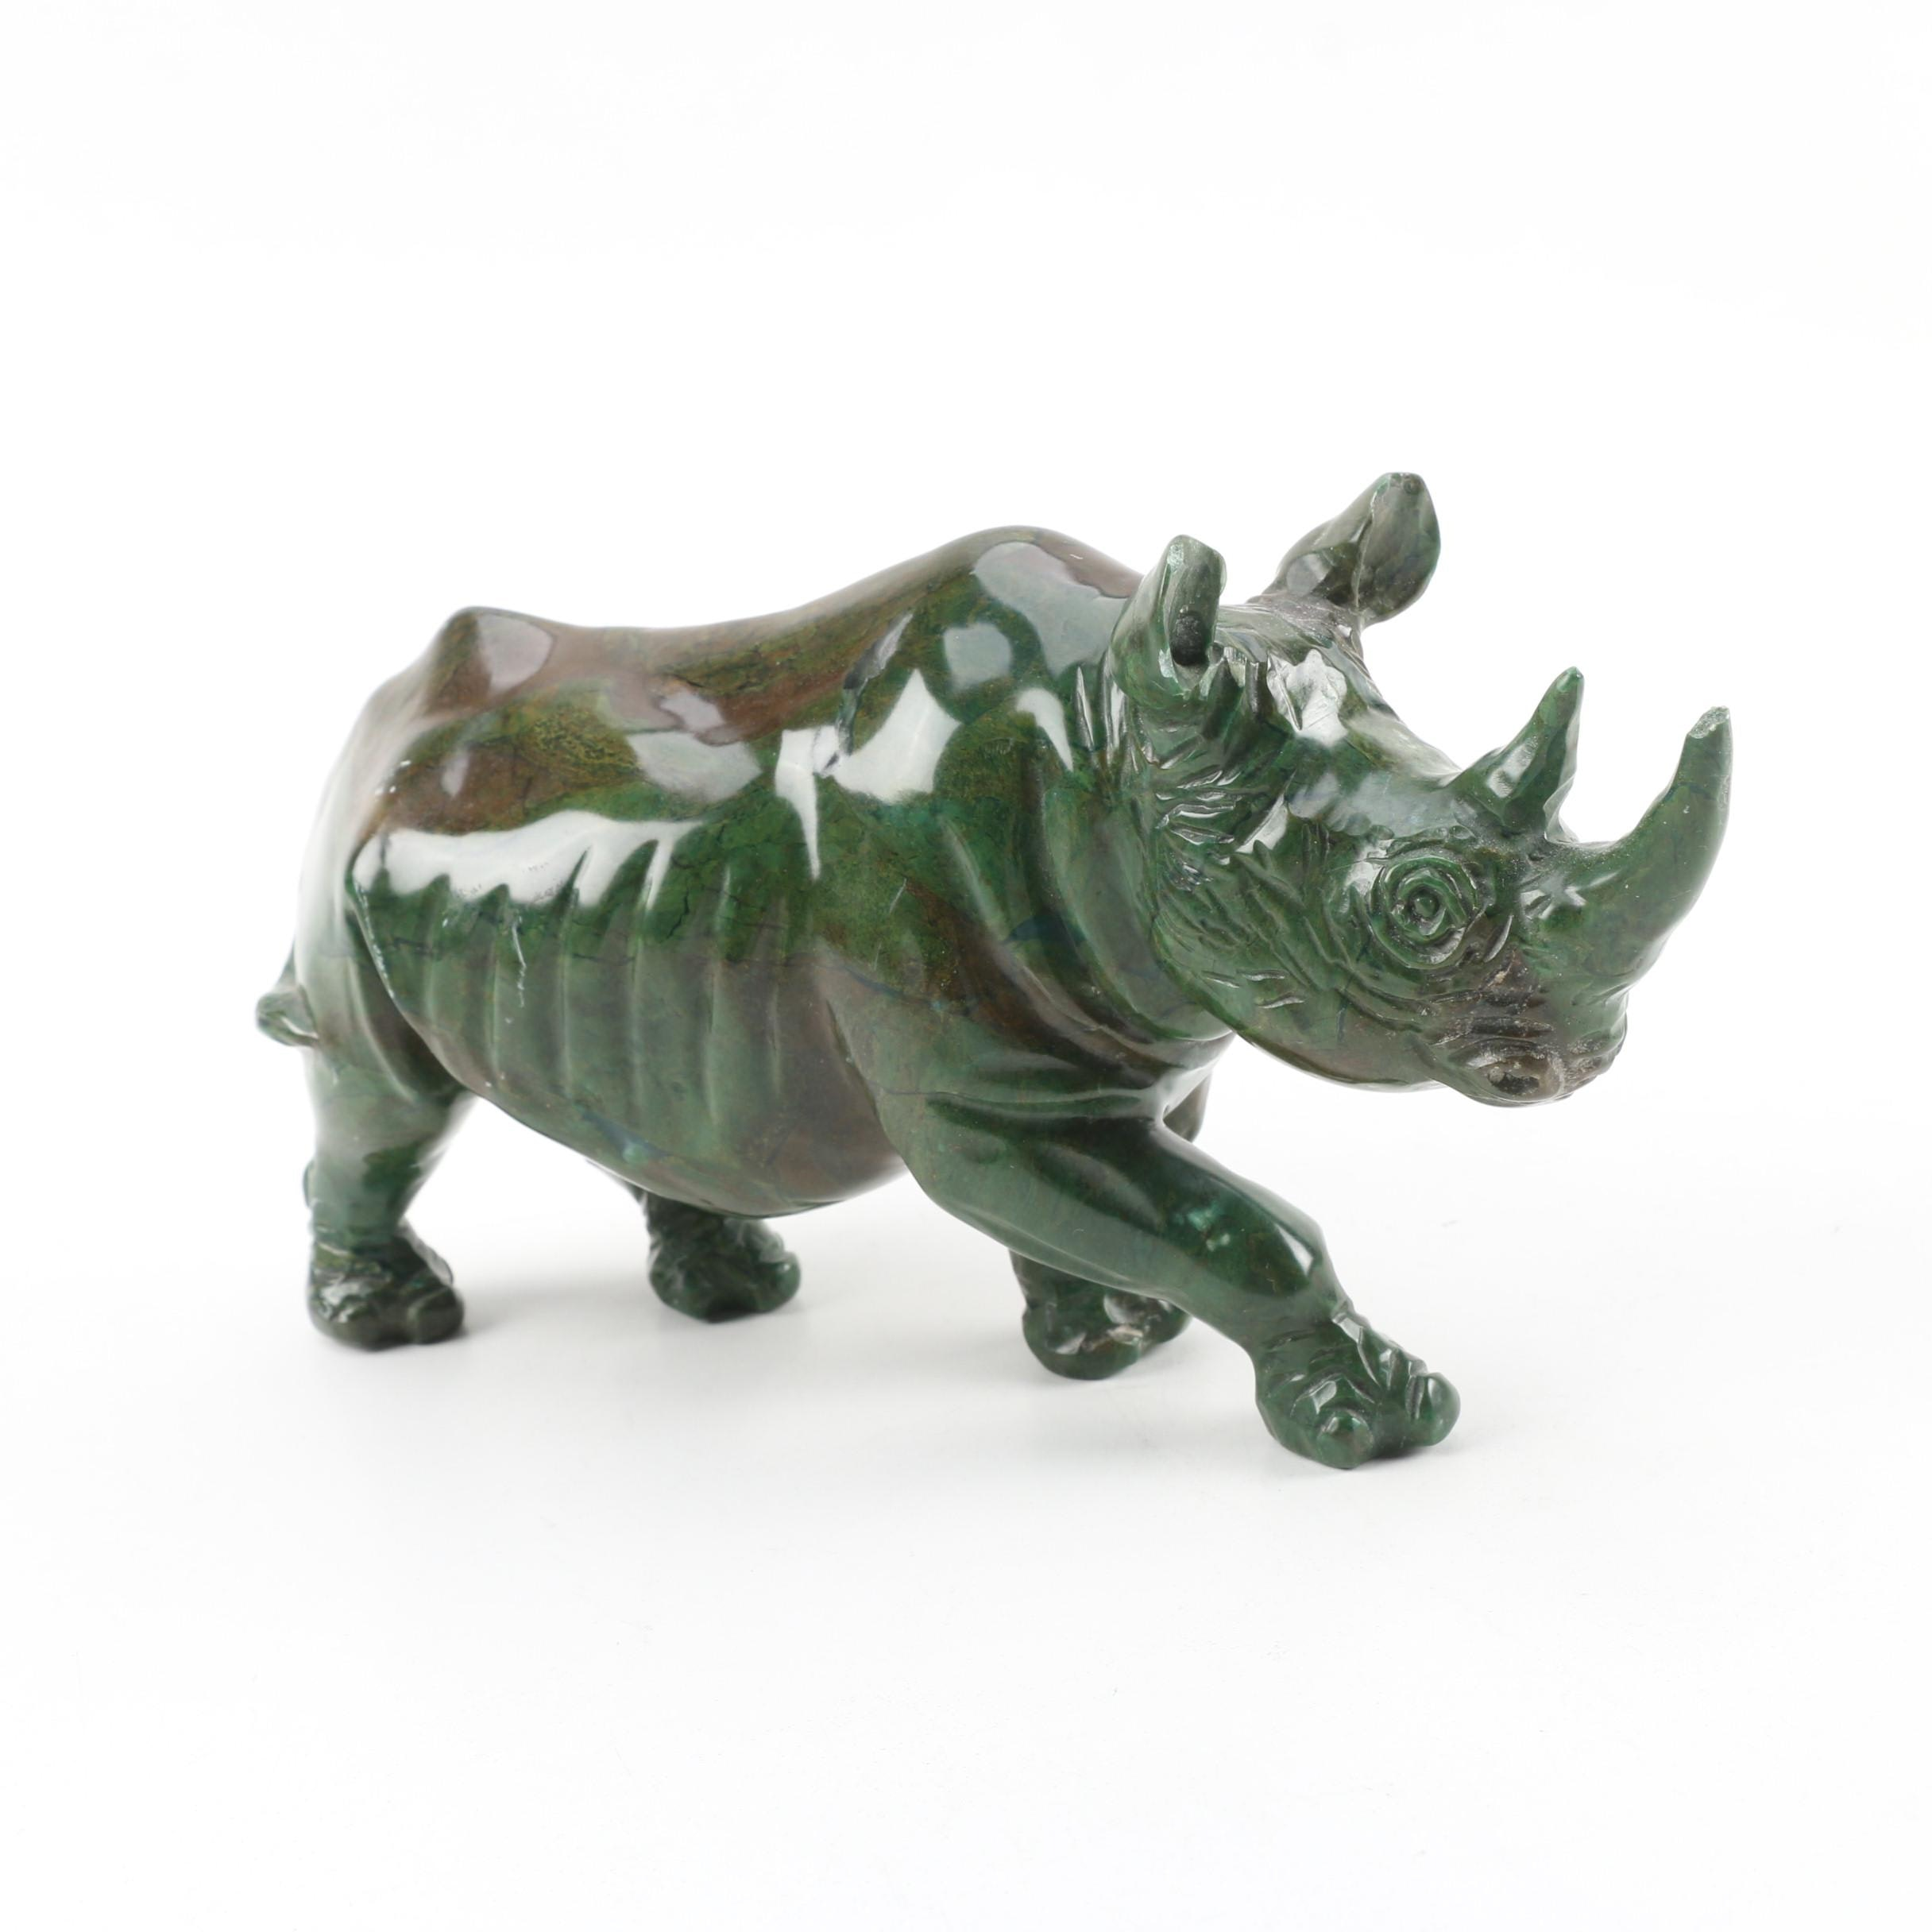 Carved Green Stone Rhinoceros Figurine